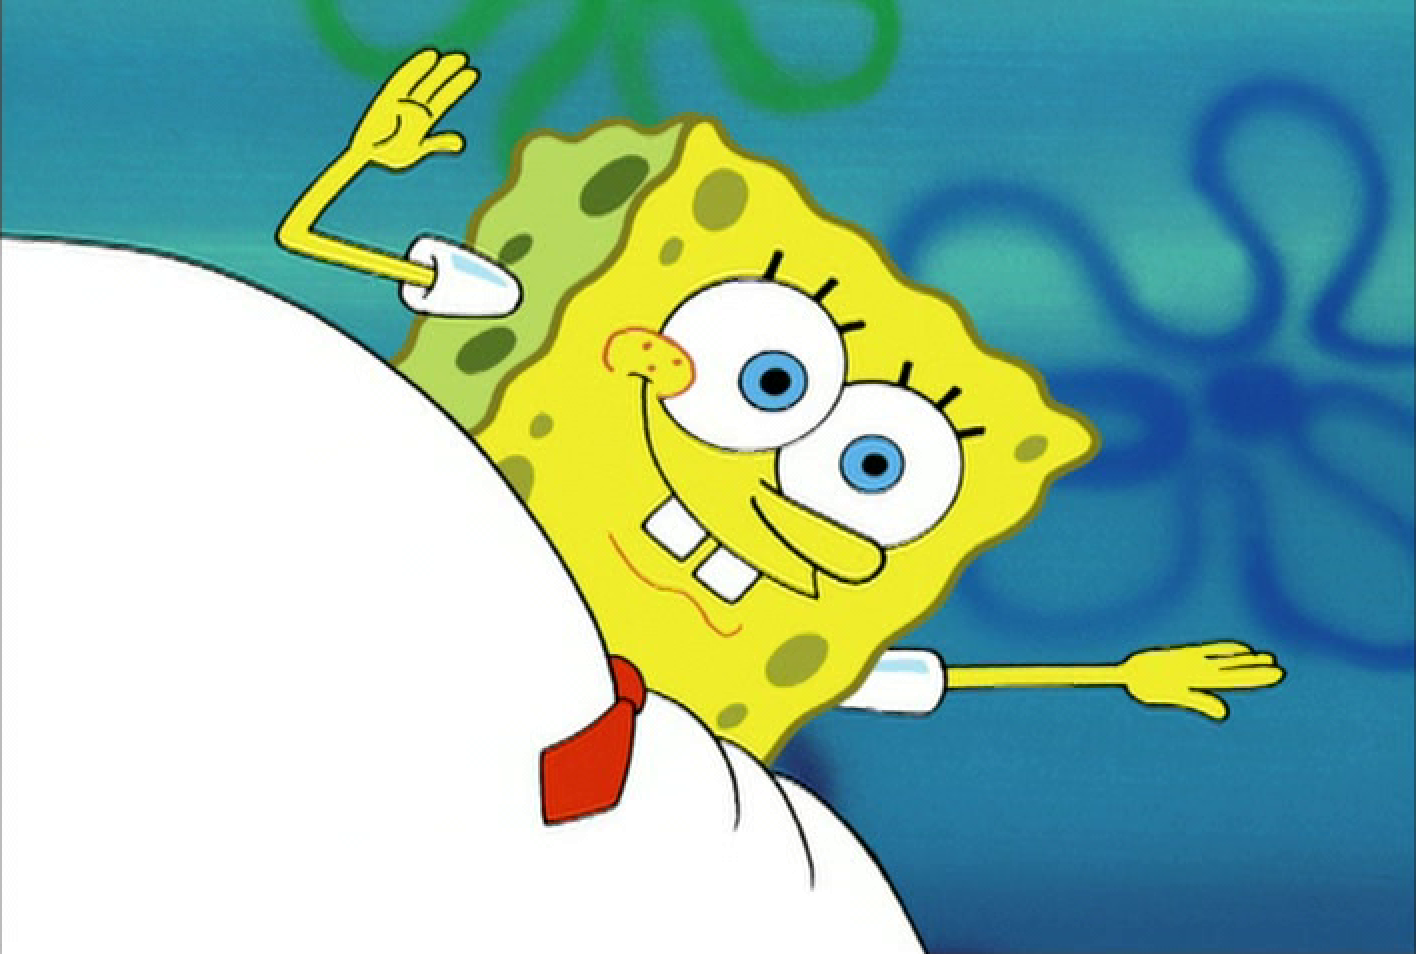 Spongebob Squarepants (a.k.a. Frosty the Snowman)